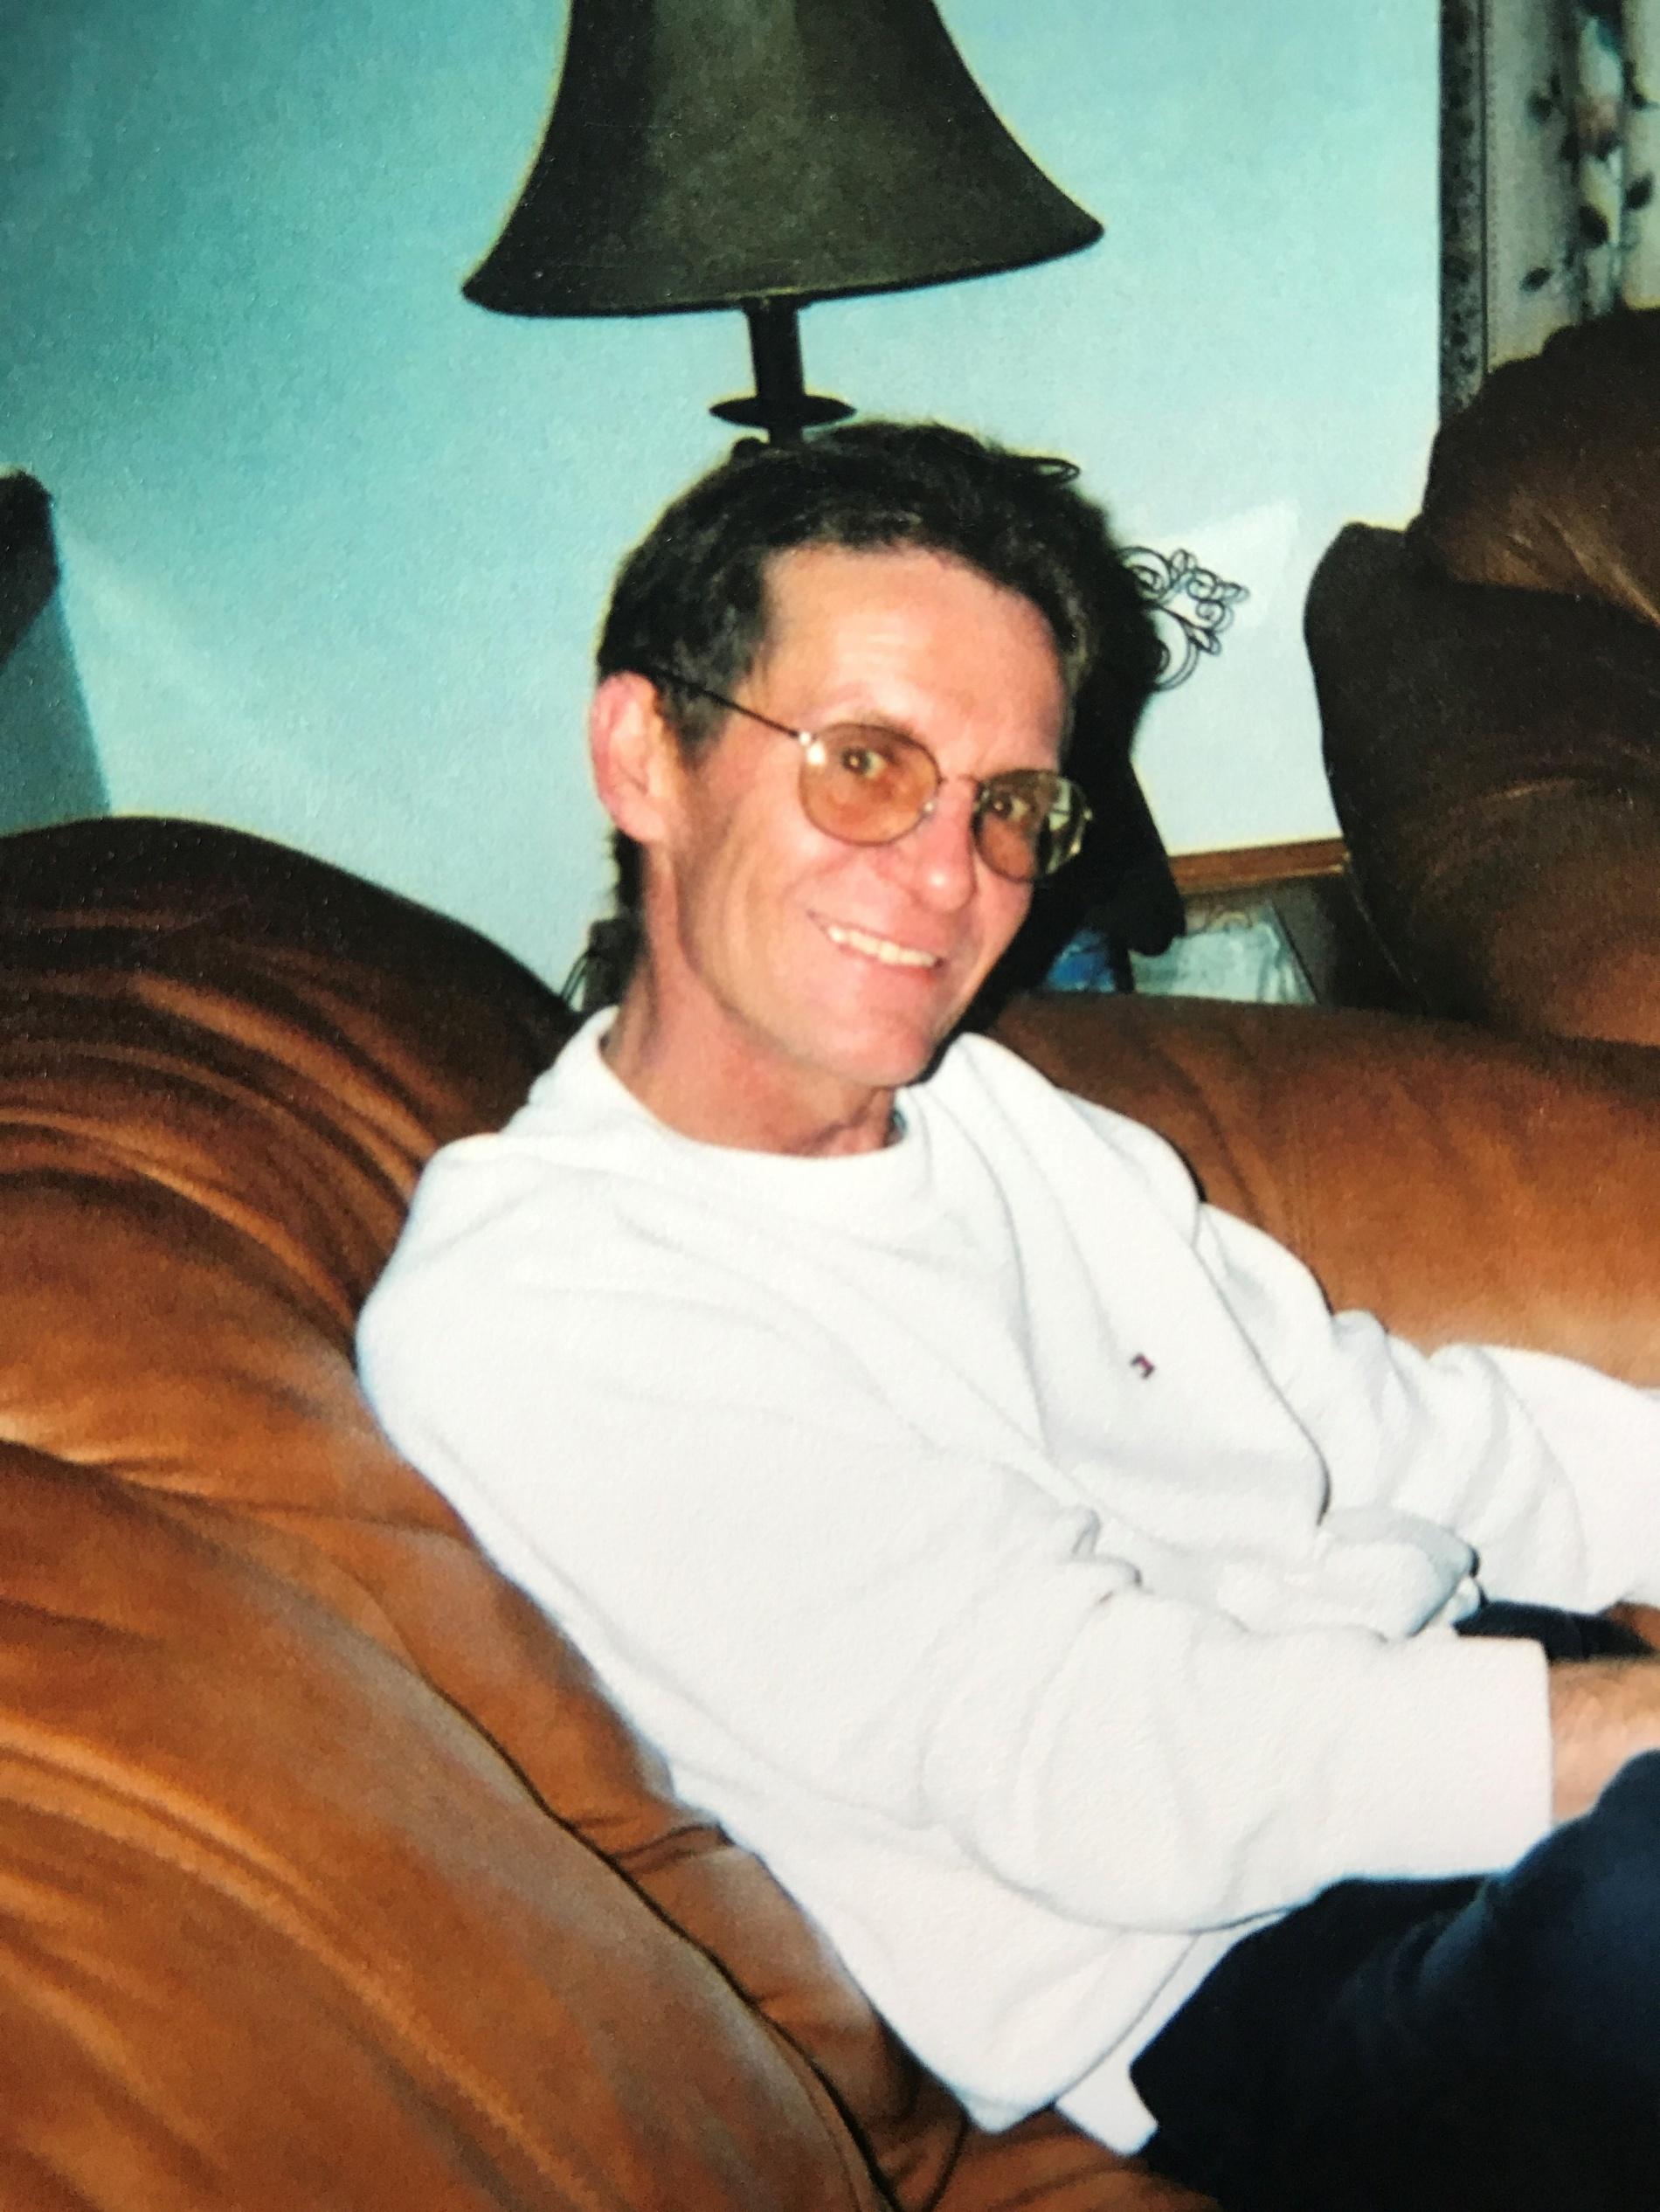 Alexander Alan Marsh, 62, Scottsbluff